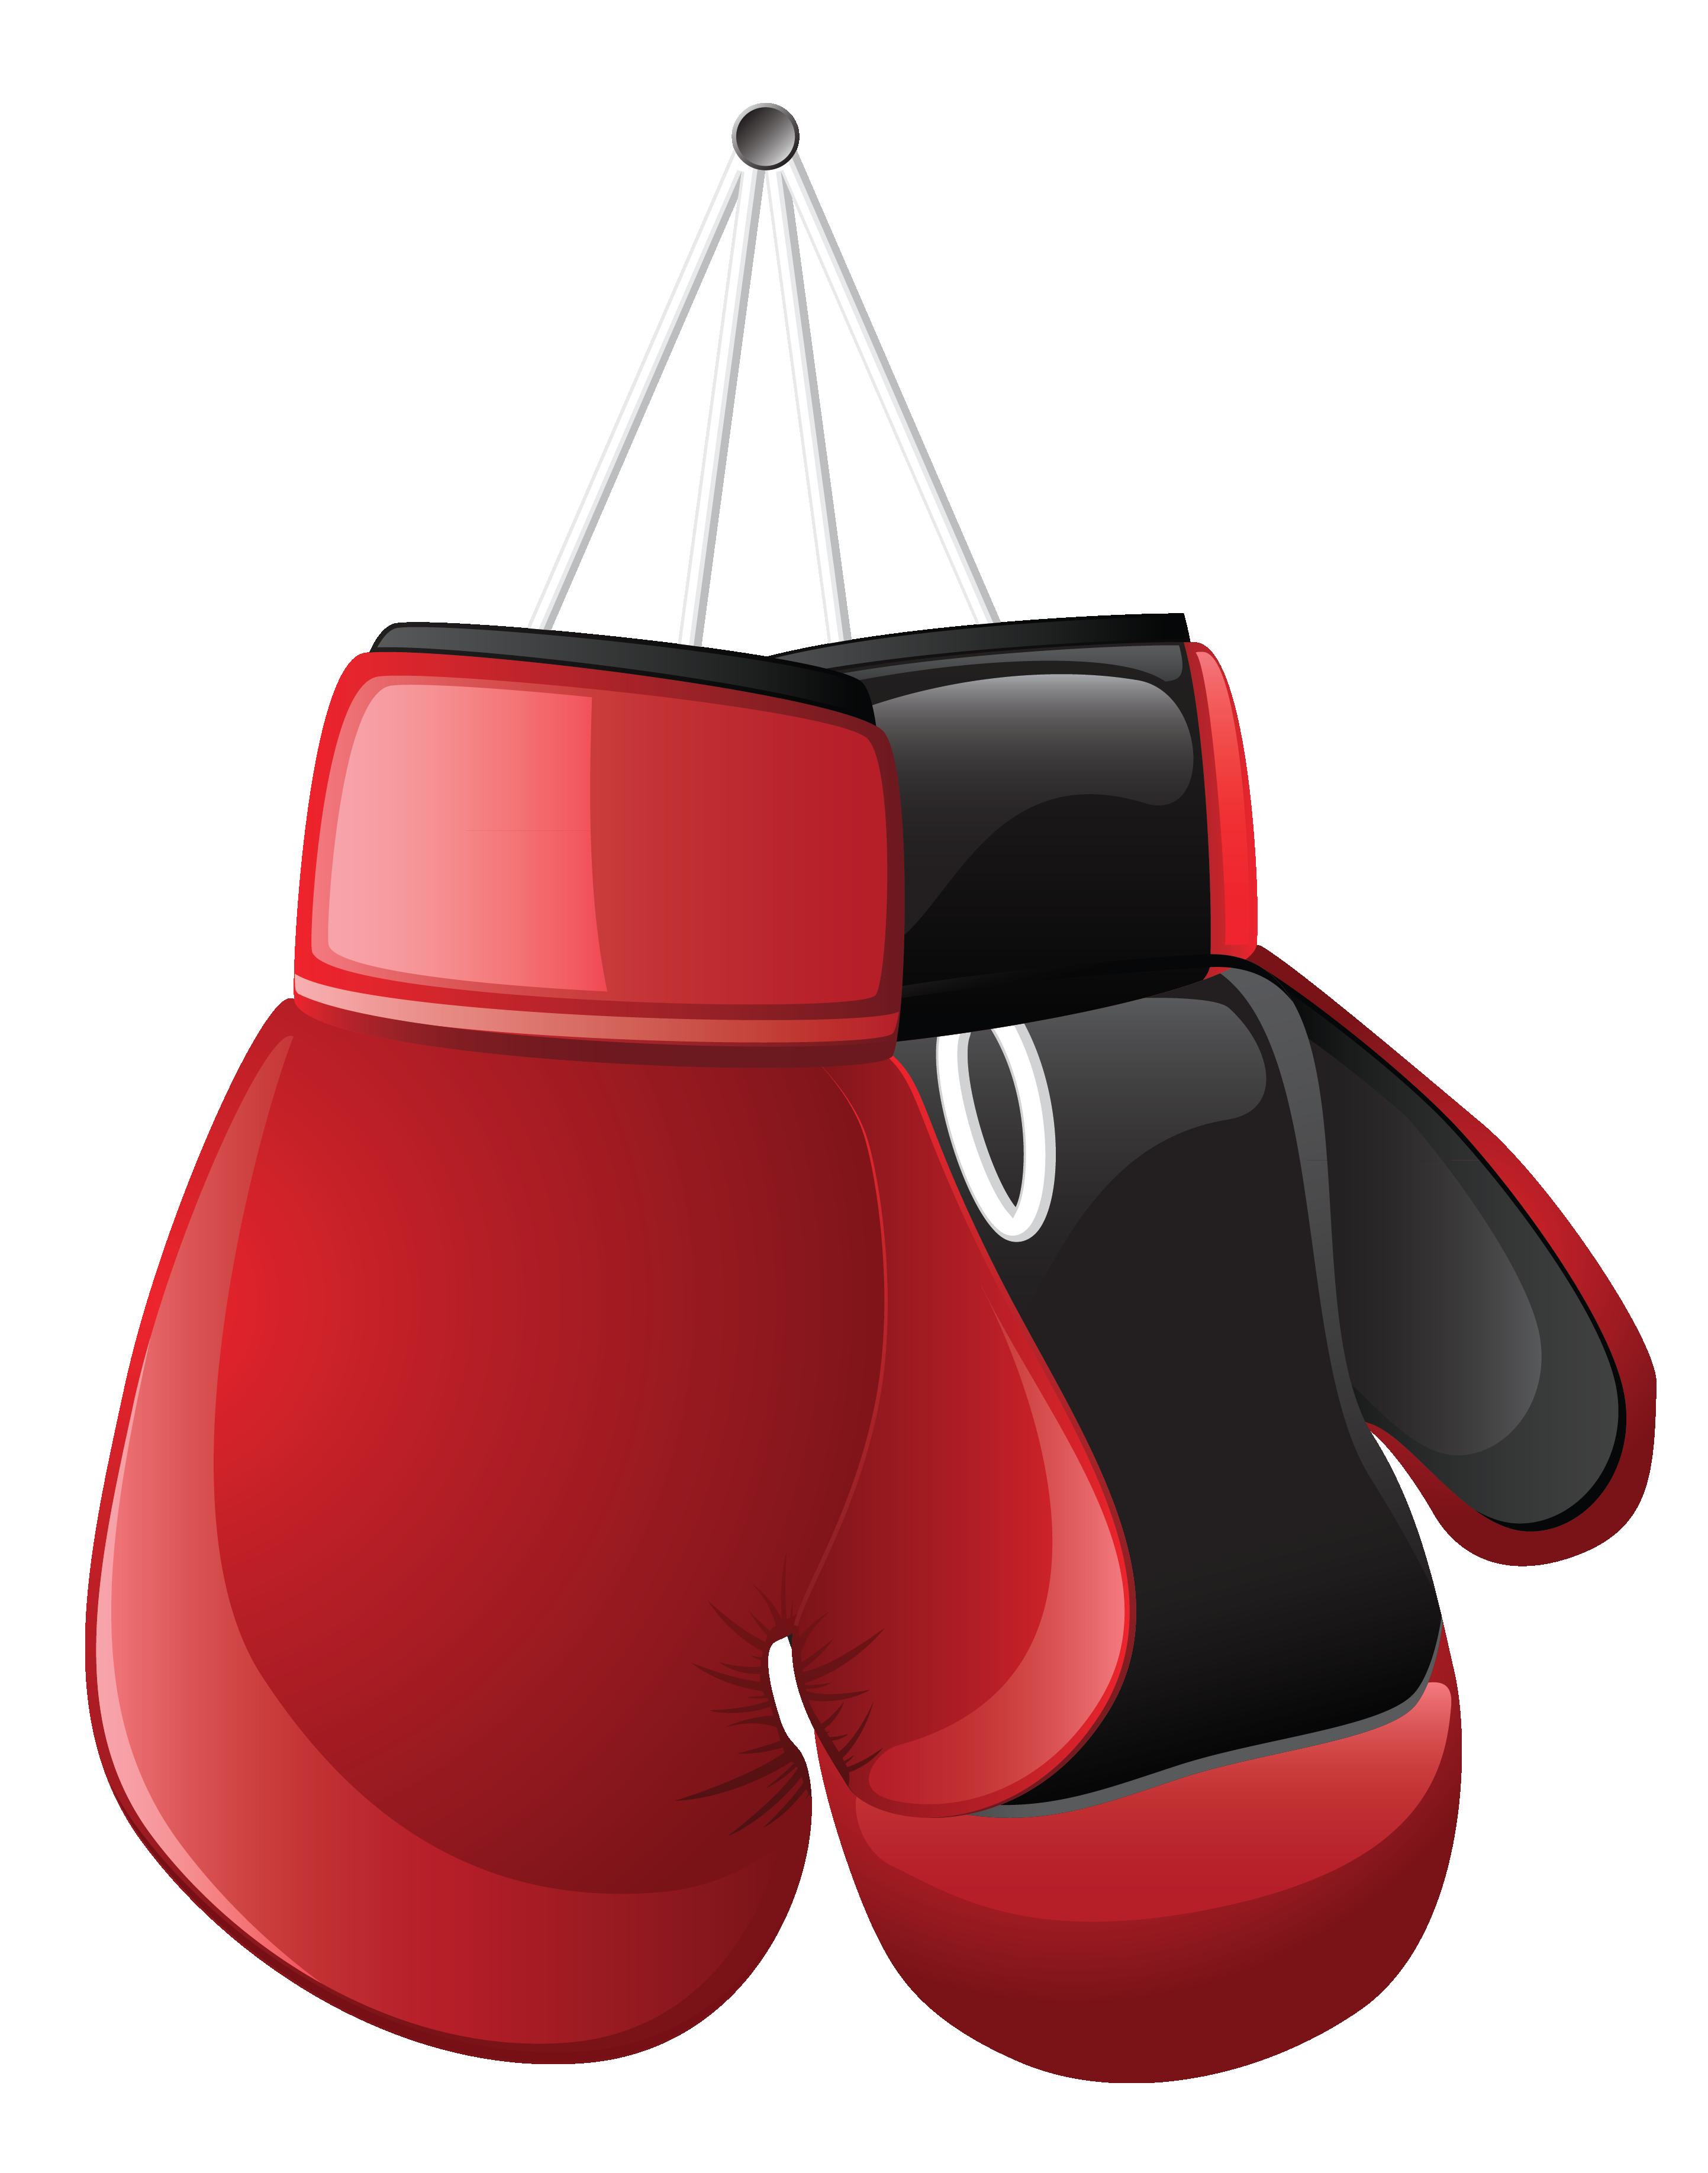 nyrkkeily